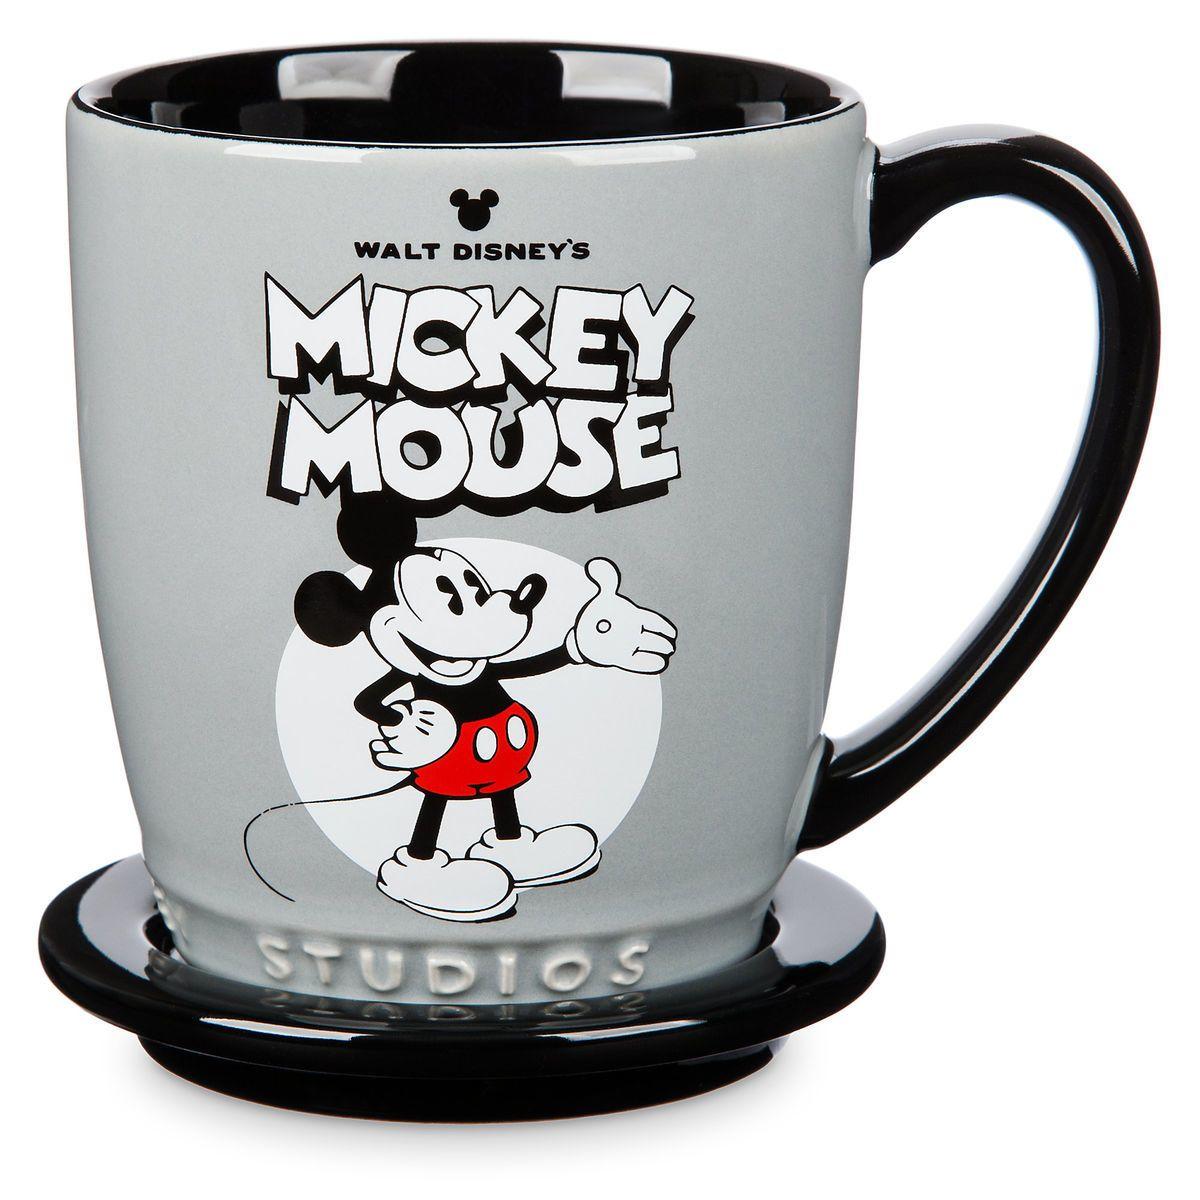 363ea3dd8c681 Mickey and Minnie Mouse Mug and Coaster Set - Walt Disney Studios in ...